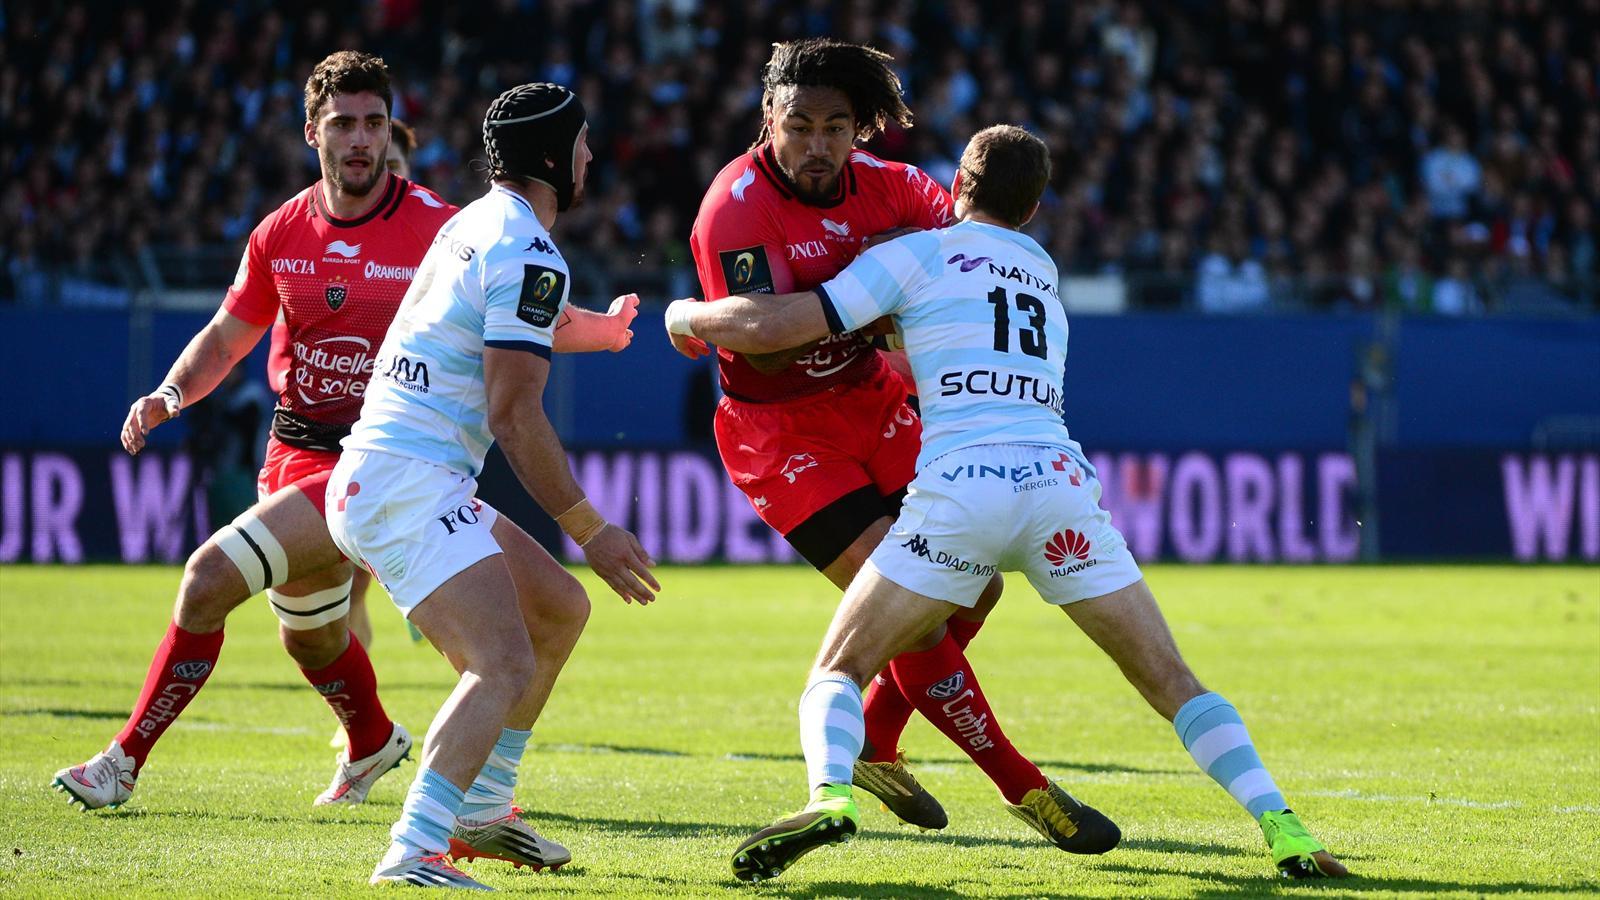 Ma'a Nonu (Toulon) face au Racing 92 - 10 avril 2016